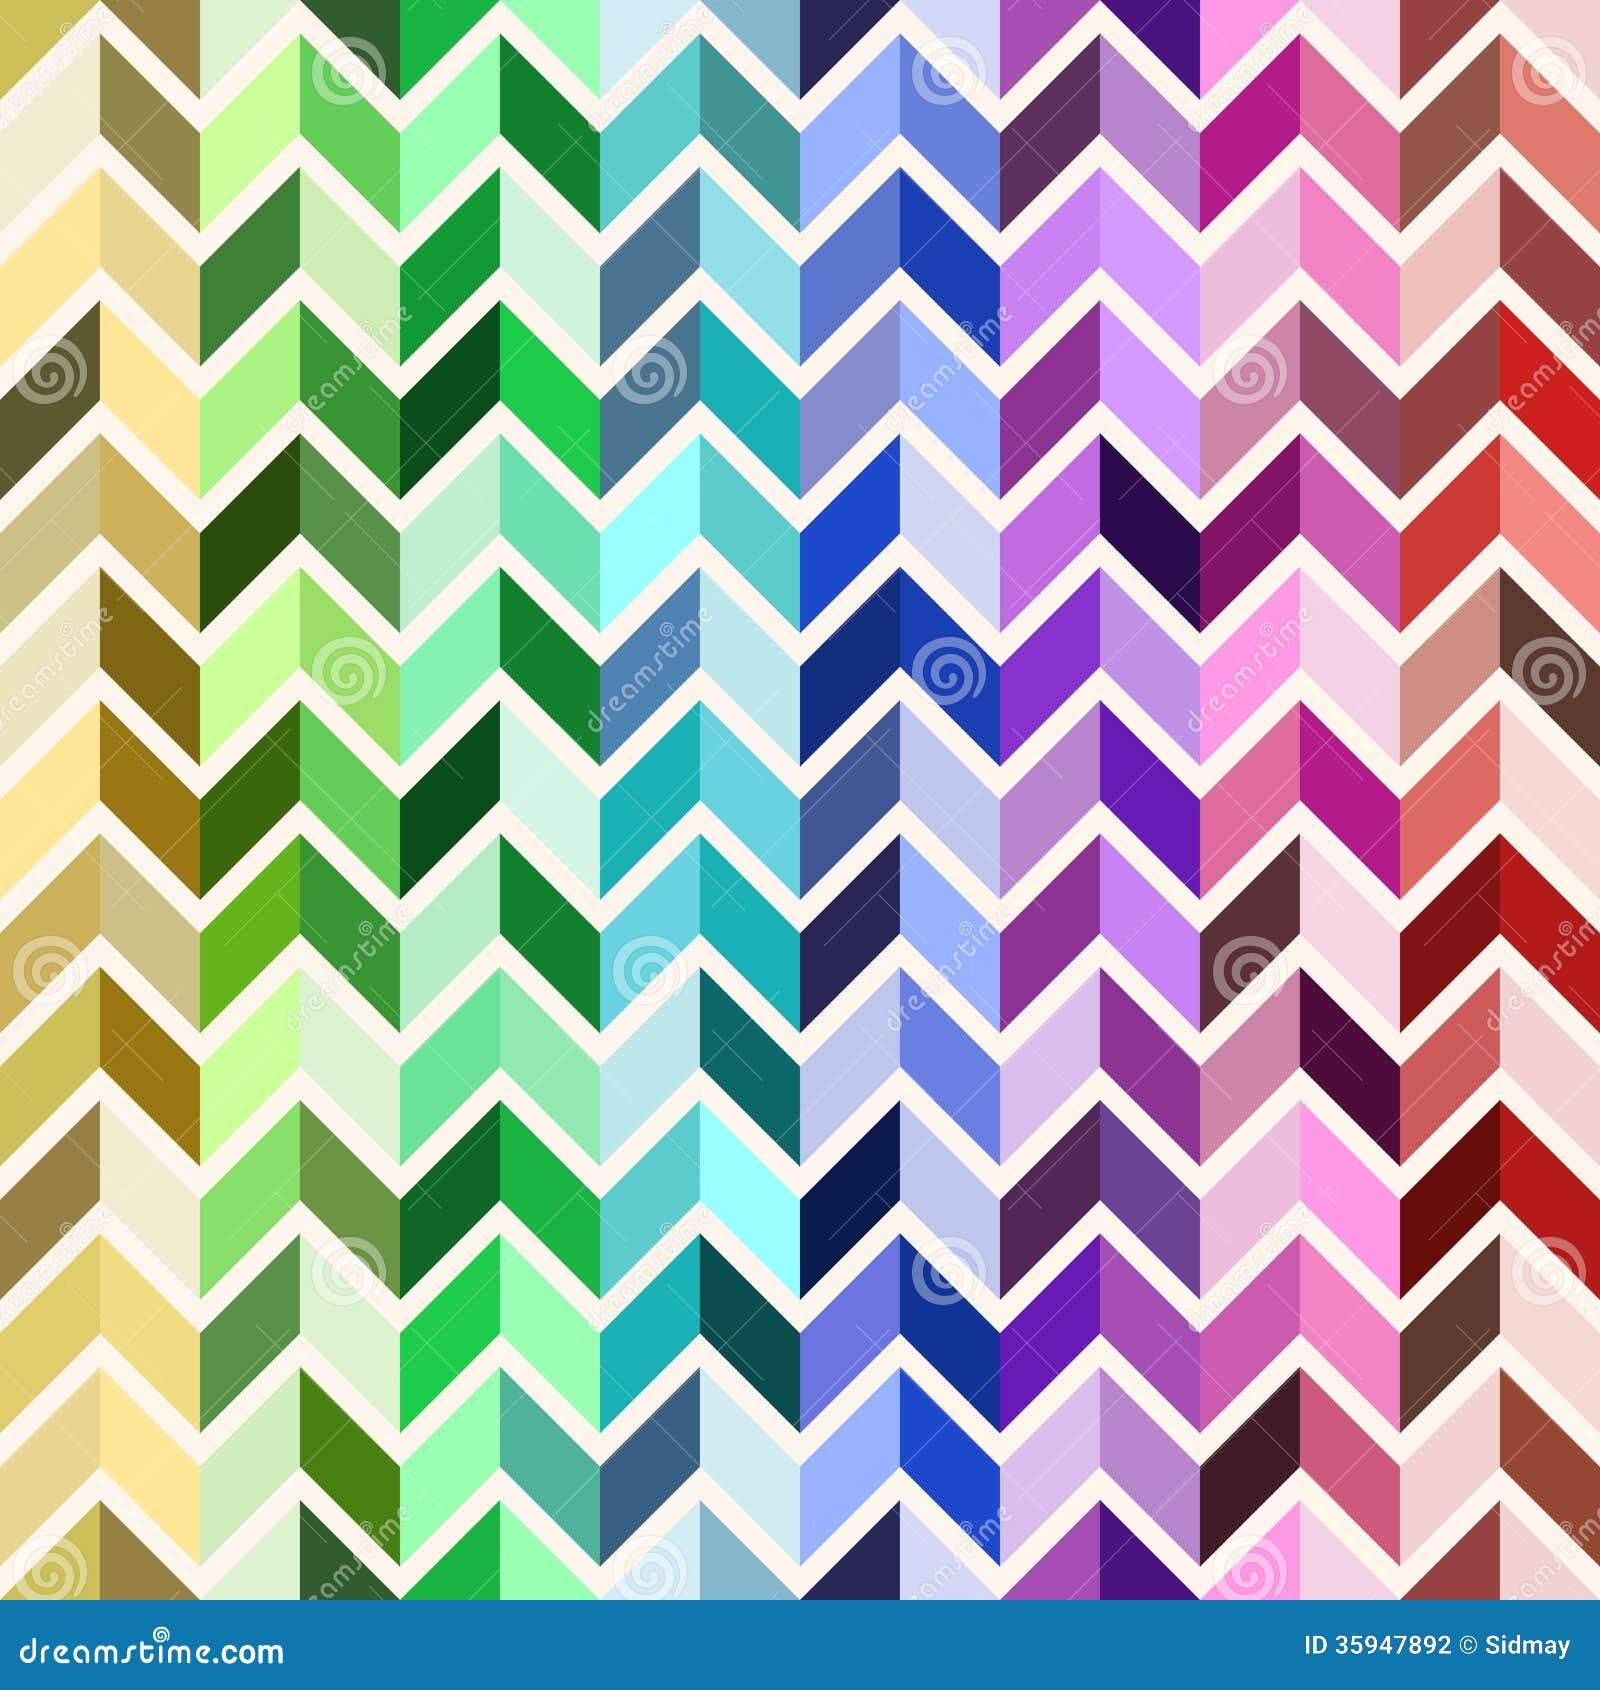 cute iphone wallpapers chevron